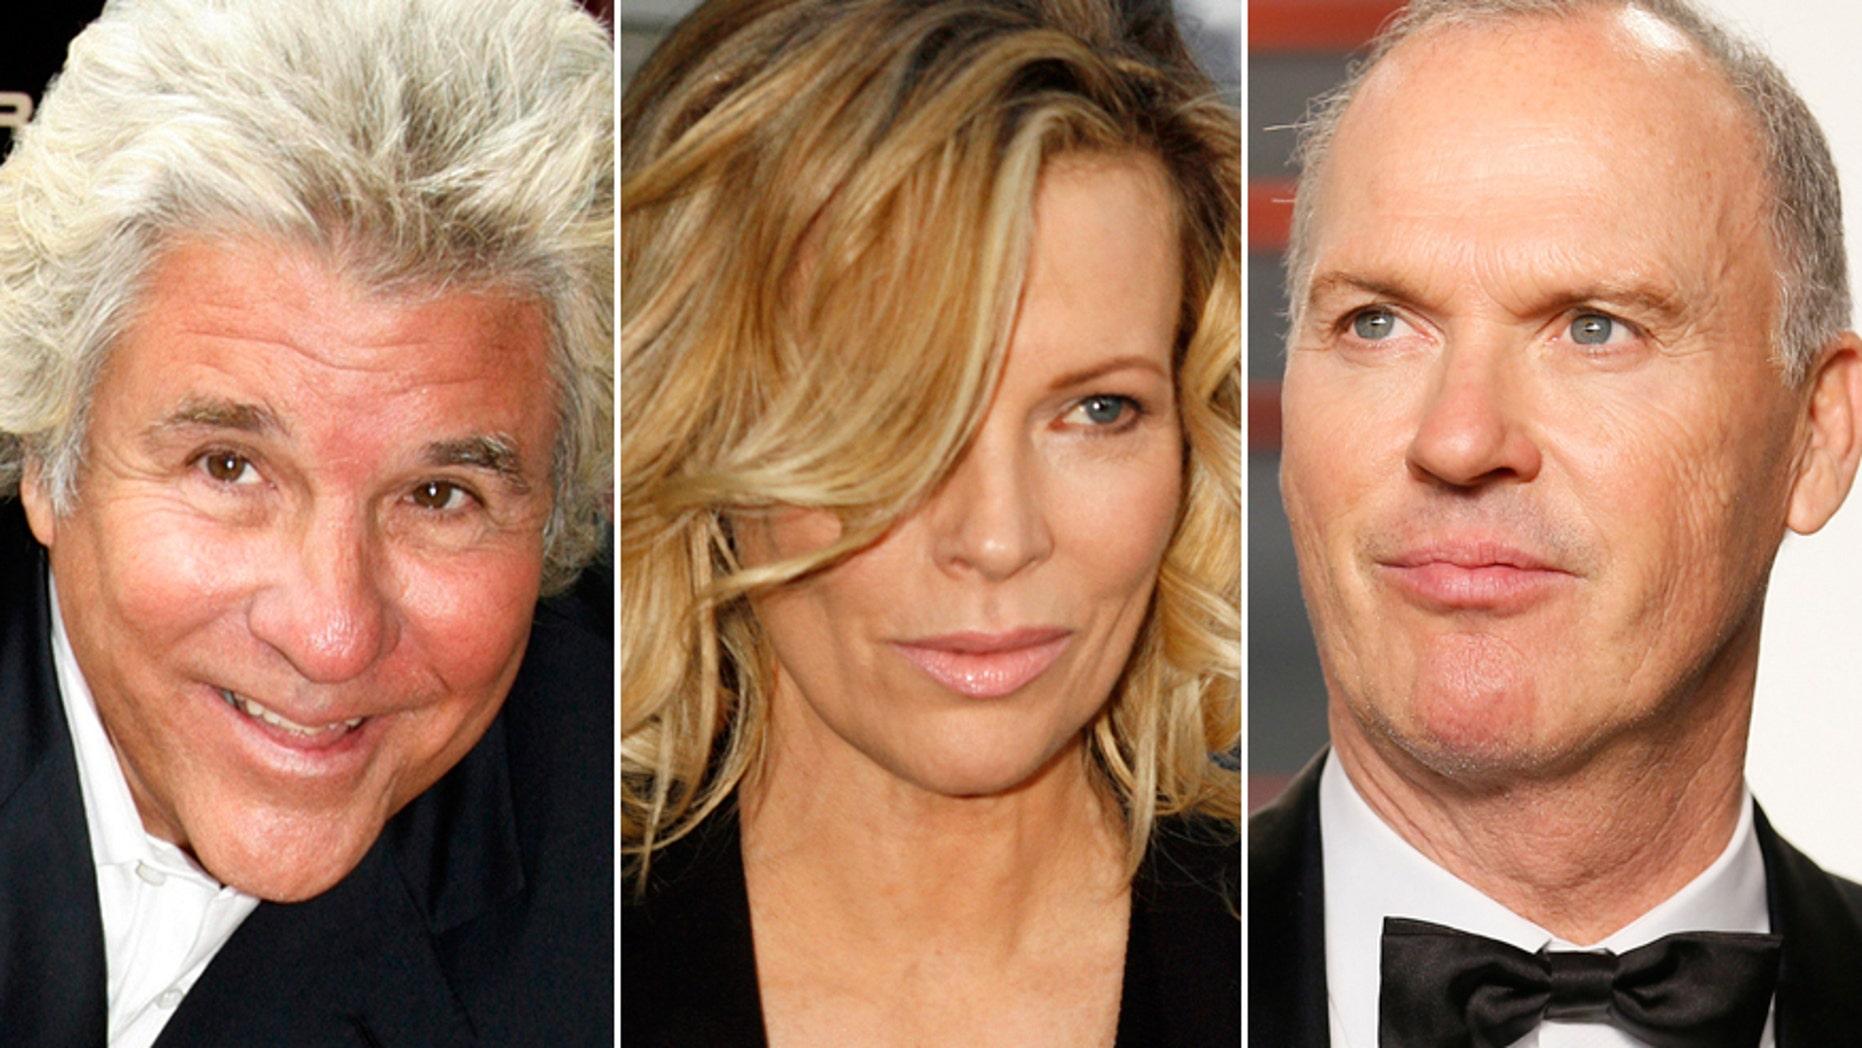 From l-r: Jon Peters, Kim Basinger and Michael Keaton.